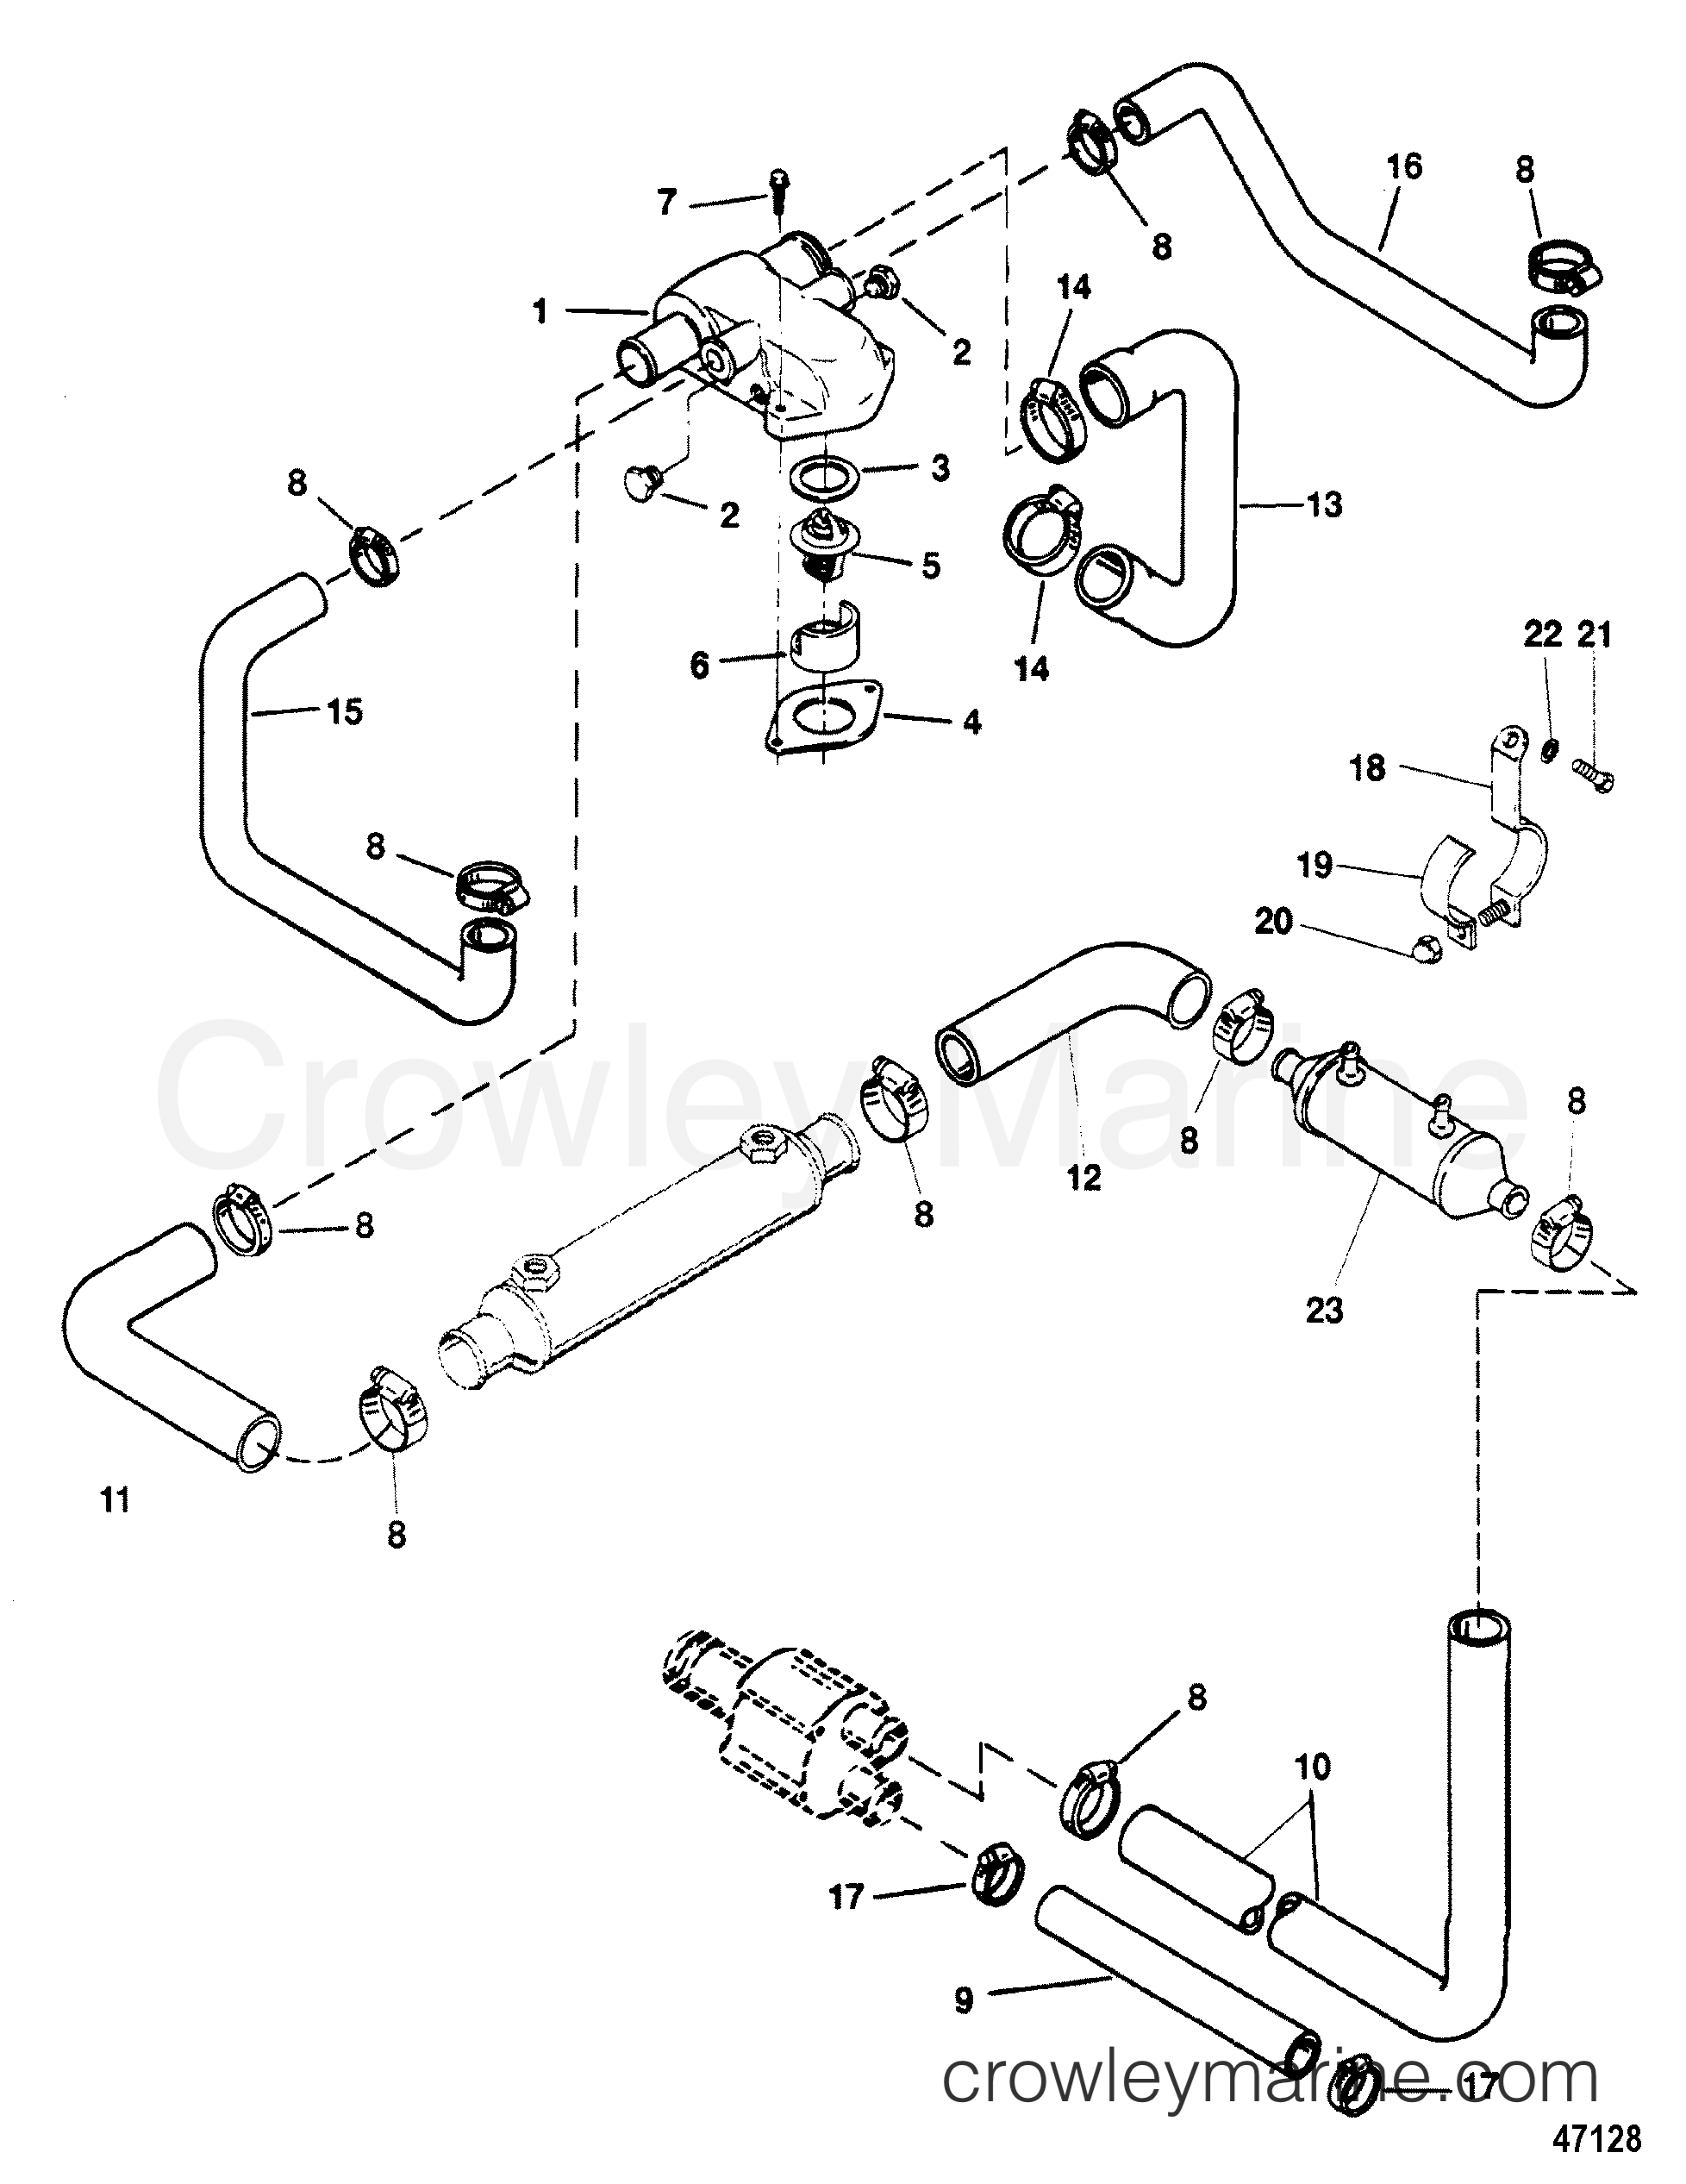 454 mercruiser engine diagram wiring library Rear End Suspension mercruiser 454 thermostat housing diagram diy enthusiasts wiring 454 mercruiser engine diagram mercruiser thermostat diagram